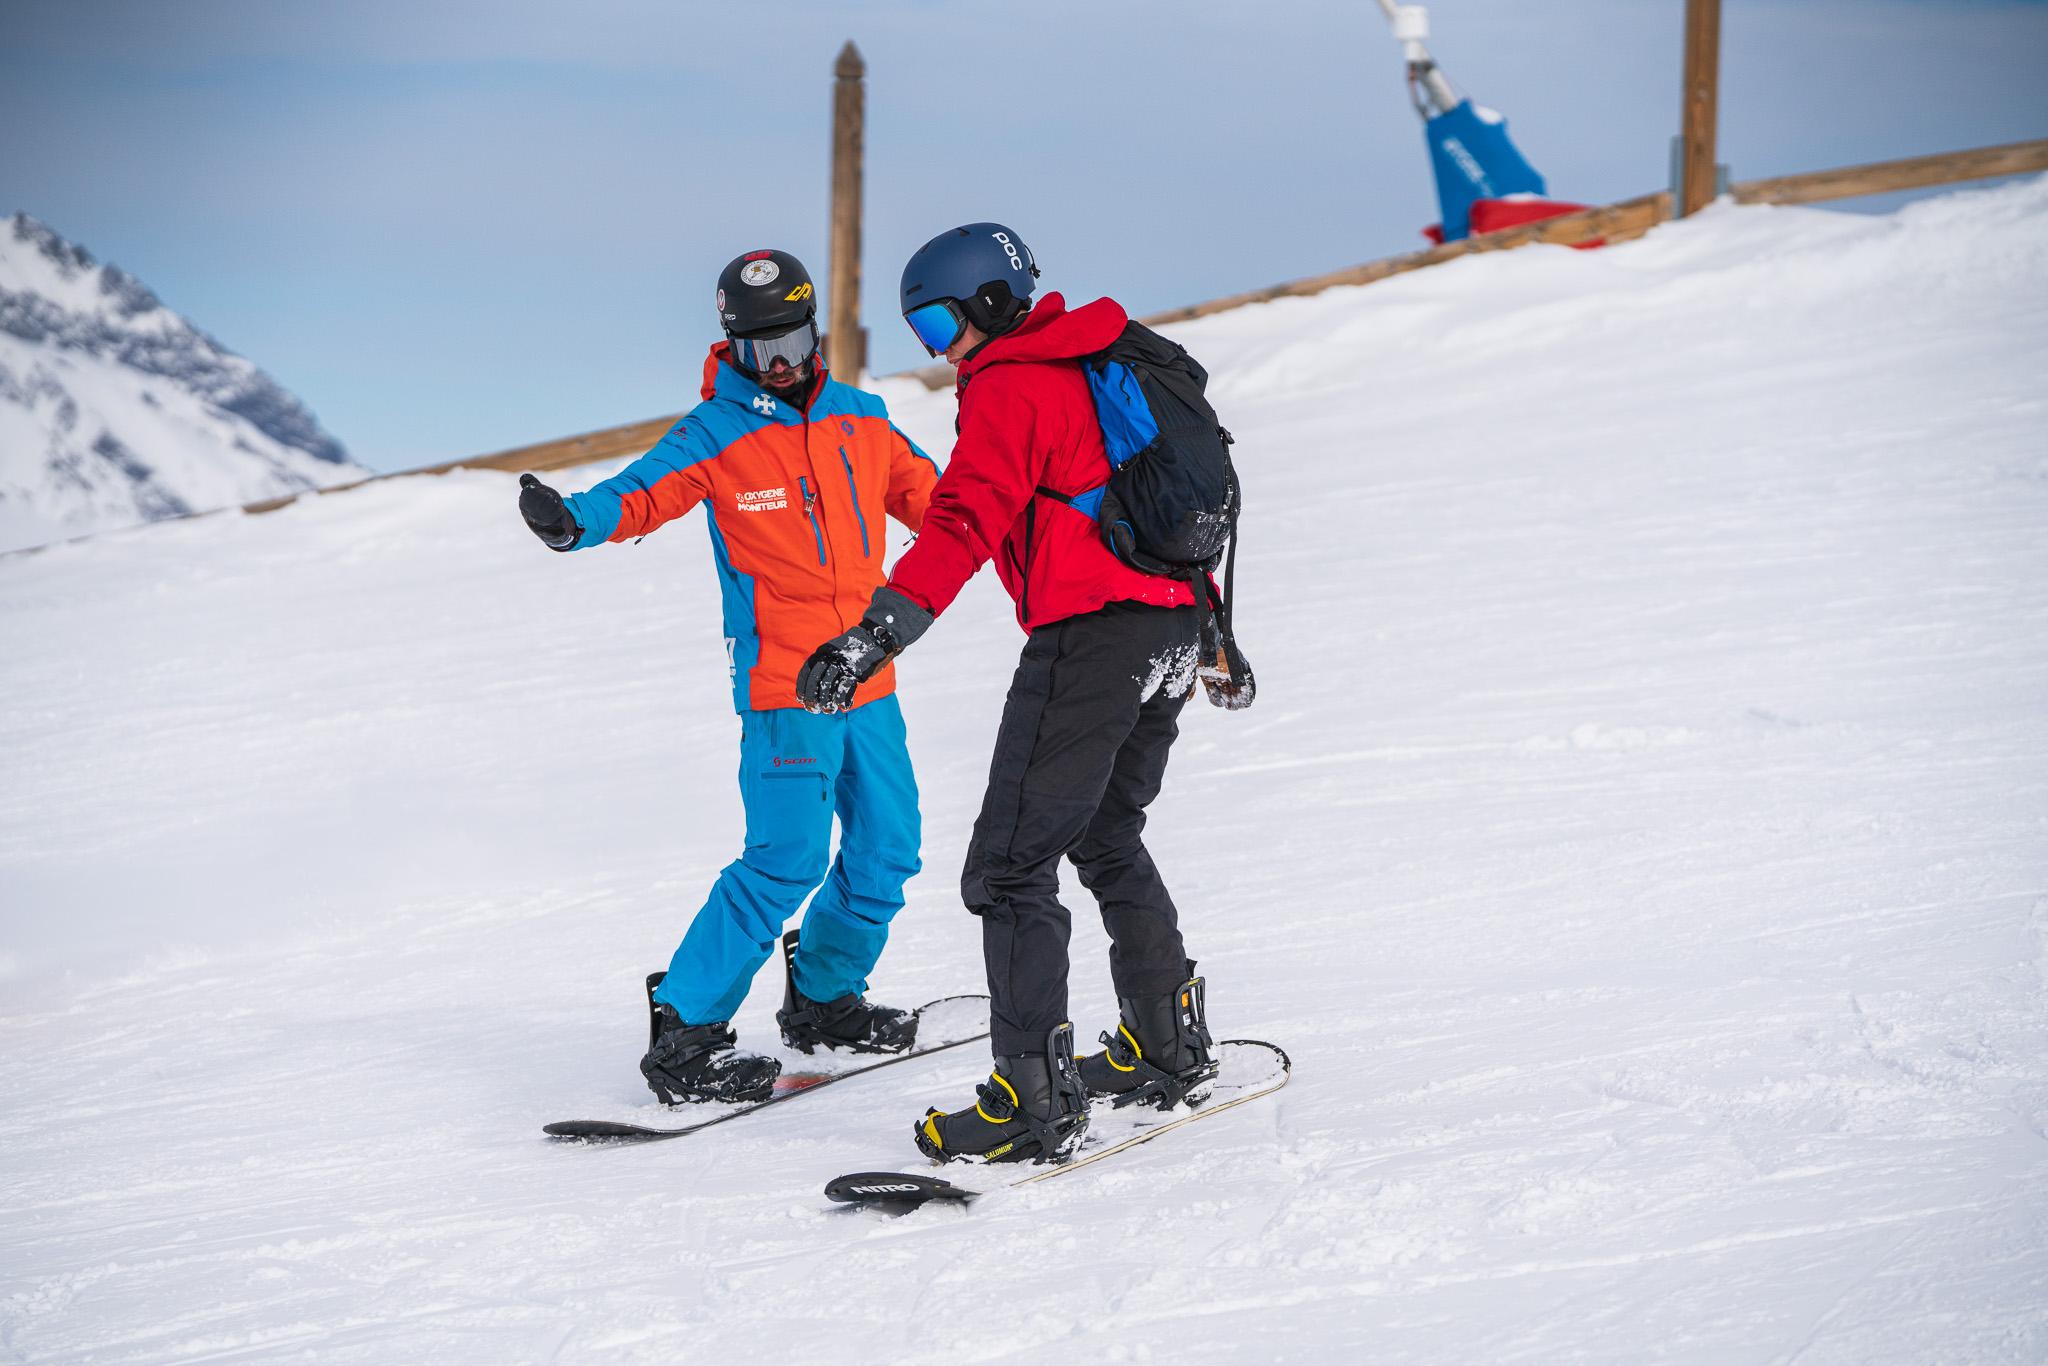 Oxygene snowboard session